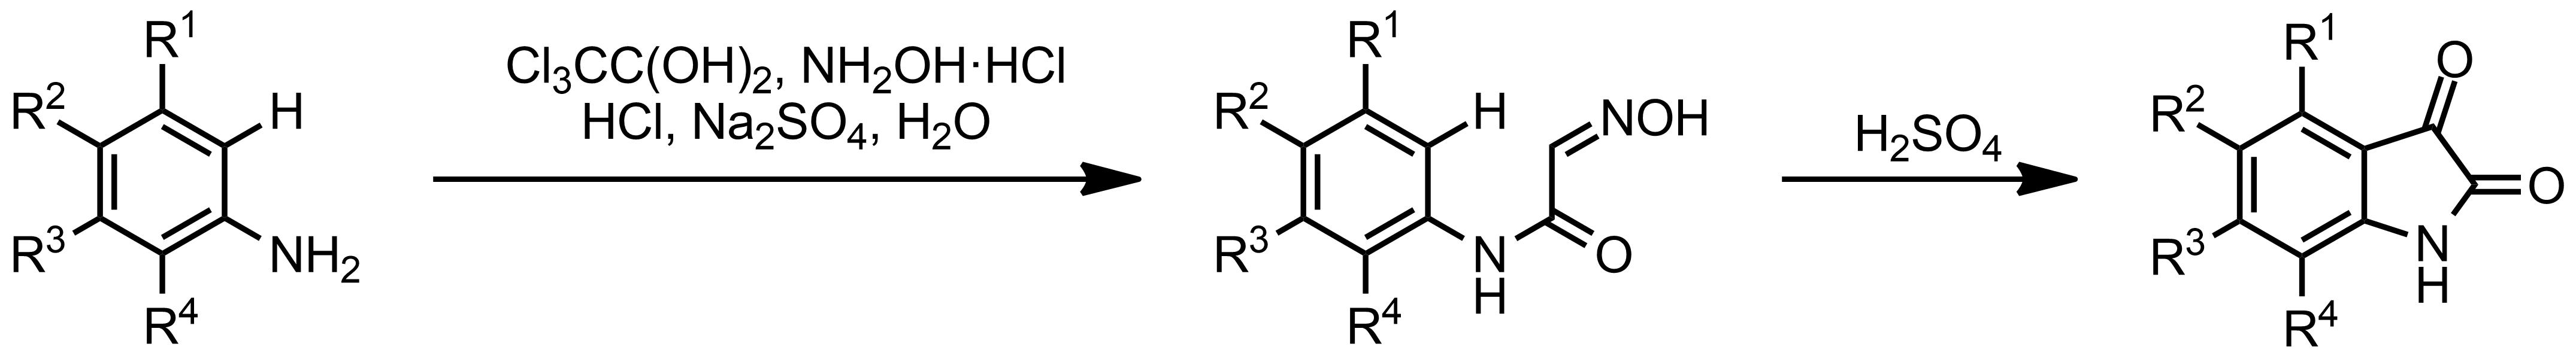 Schematic representation of the Sandmeyer Isatin Synthesis.